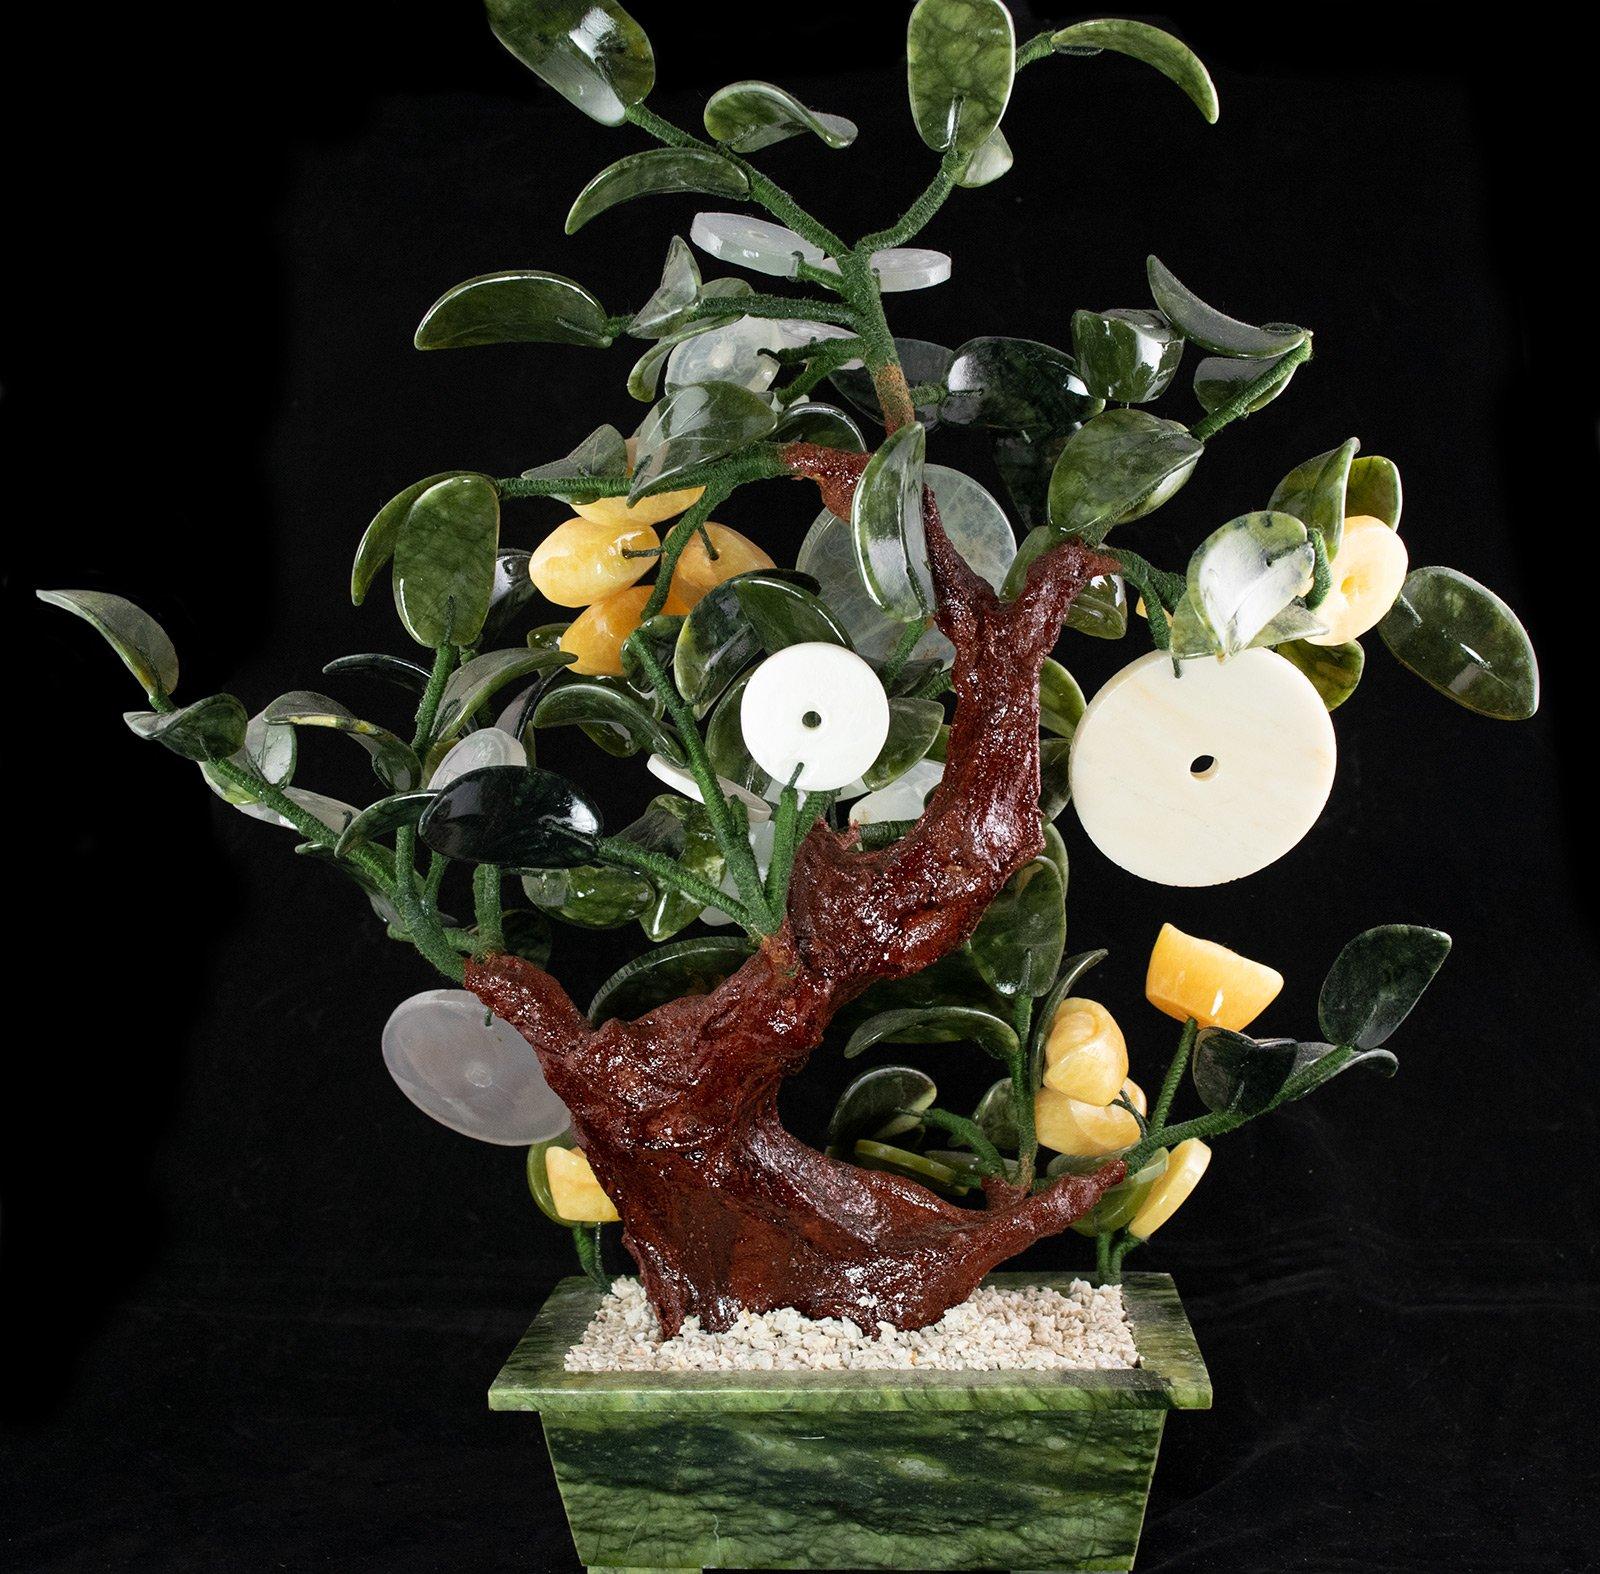 Vintage Chinese Carved Jade & Semi Precious Stone Shohin Bonsai Tree # 104 by Calibonsai (Image #1)